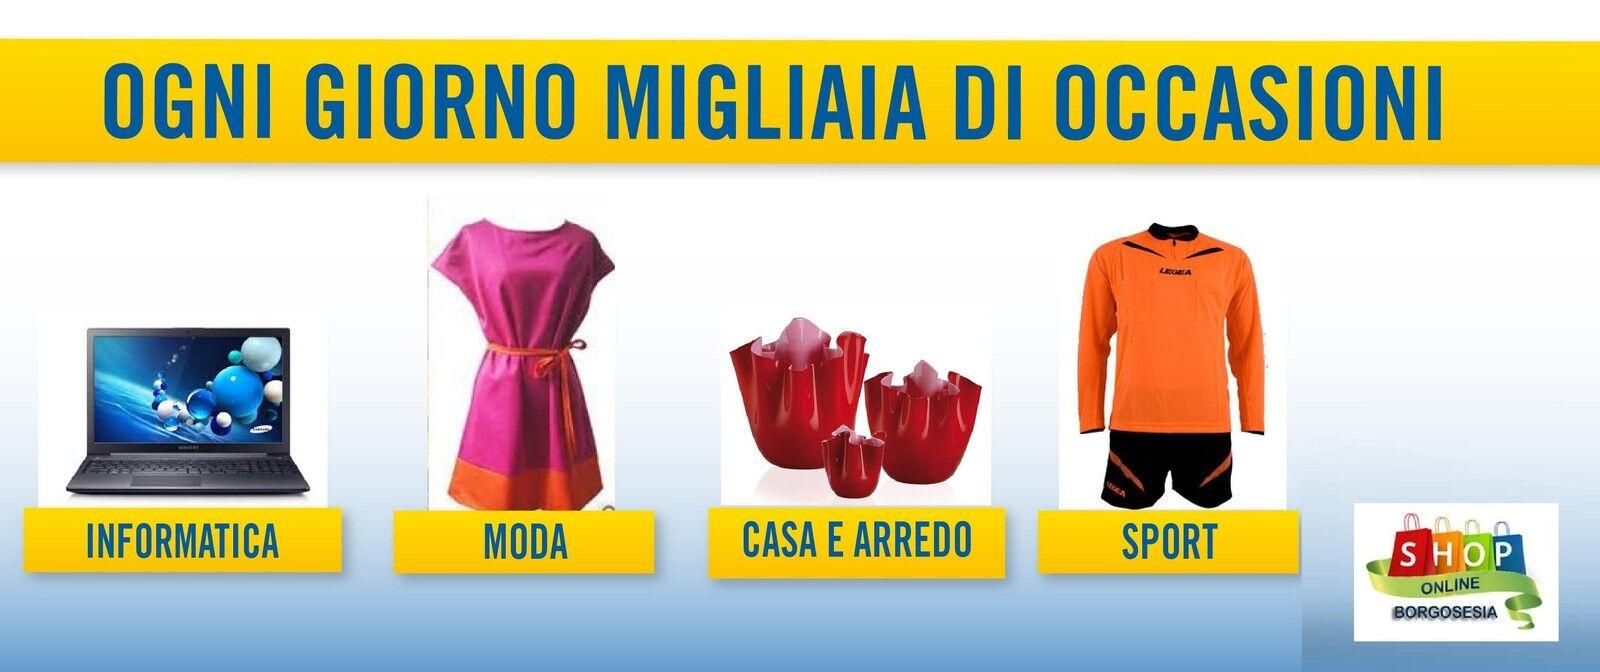 Shop-Online-BorgoSesia